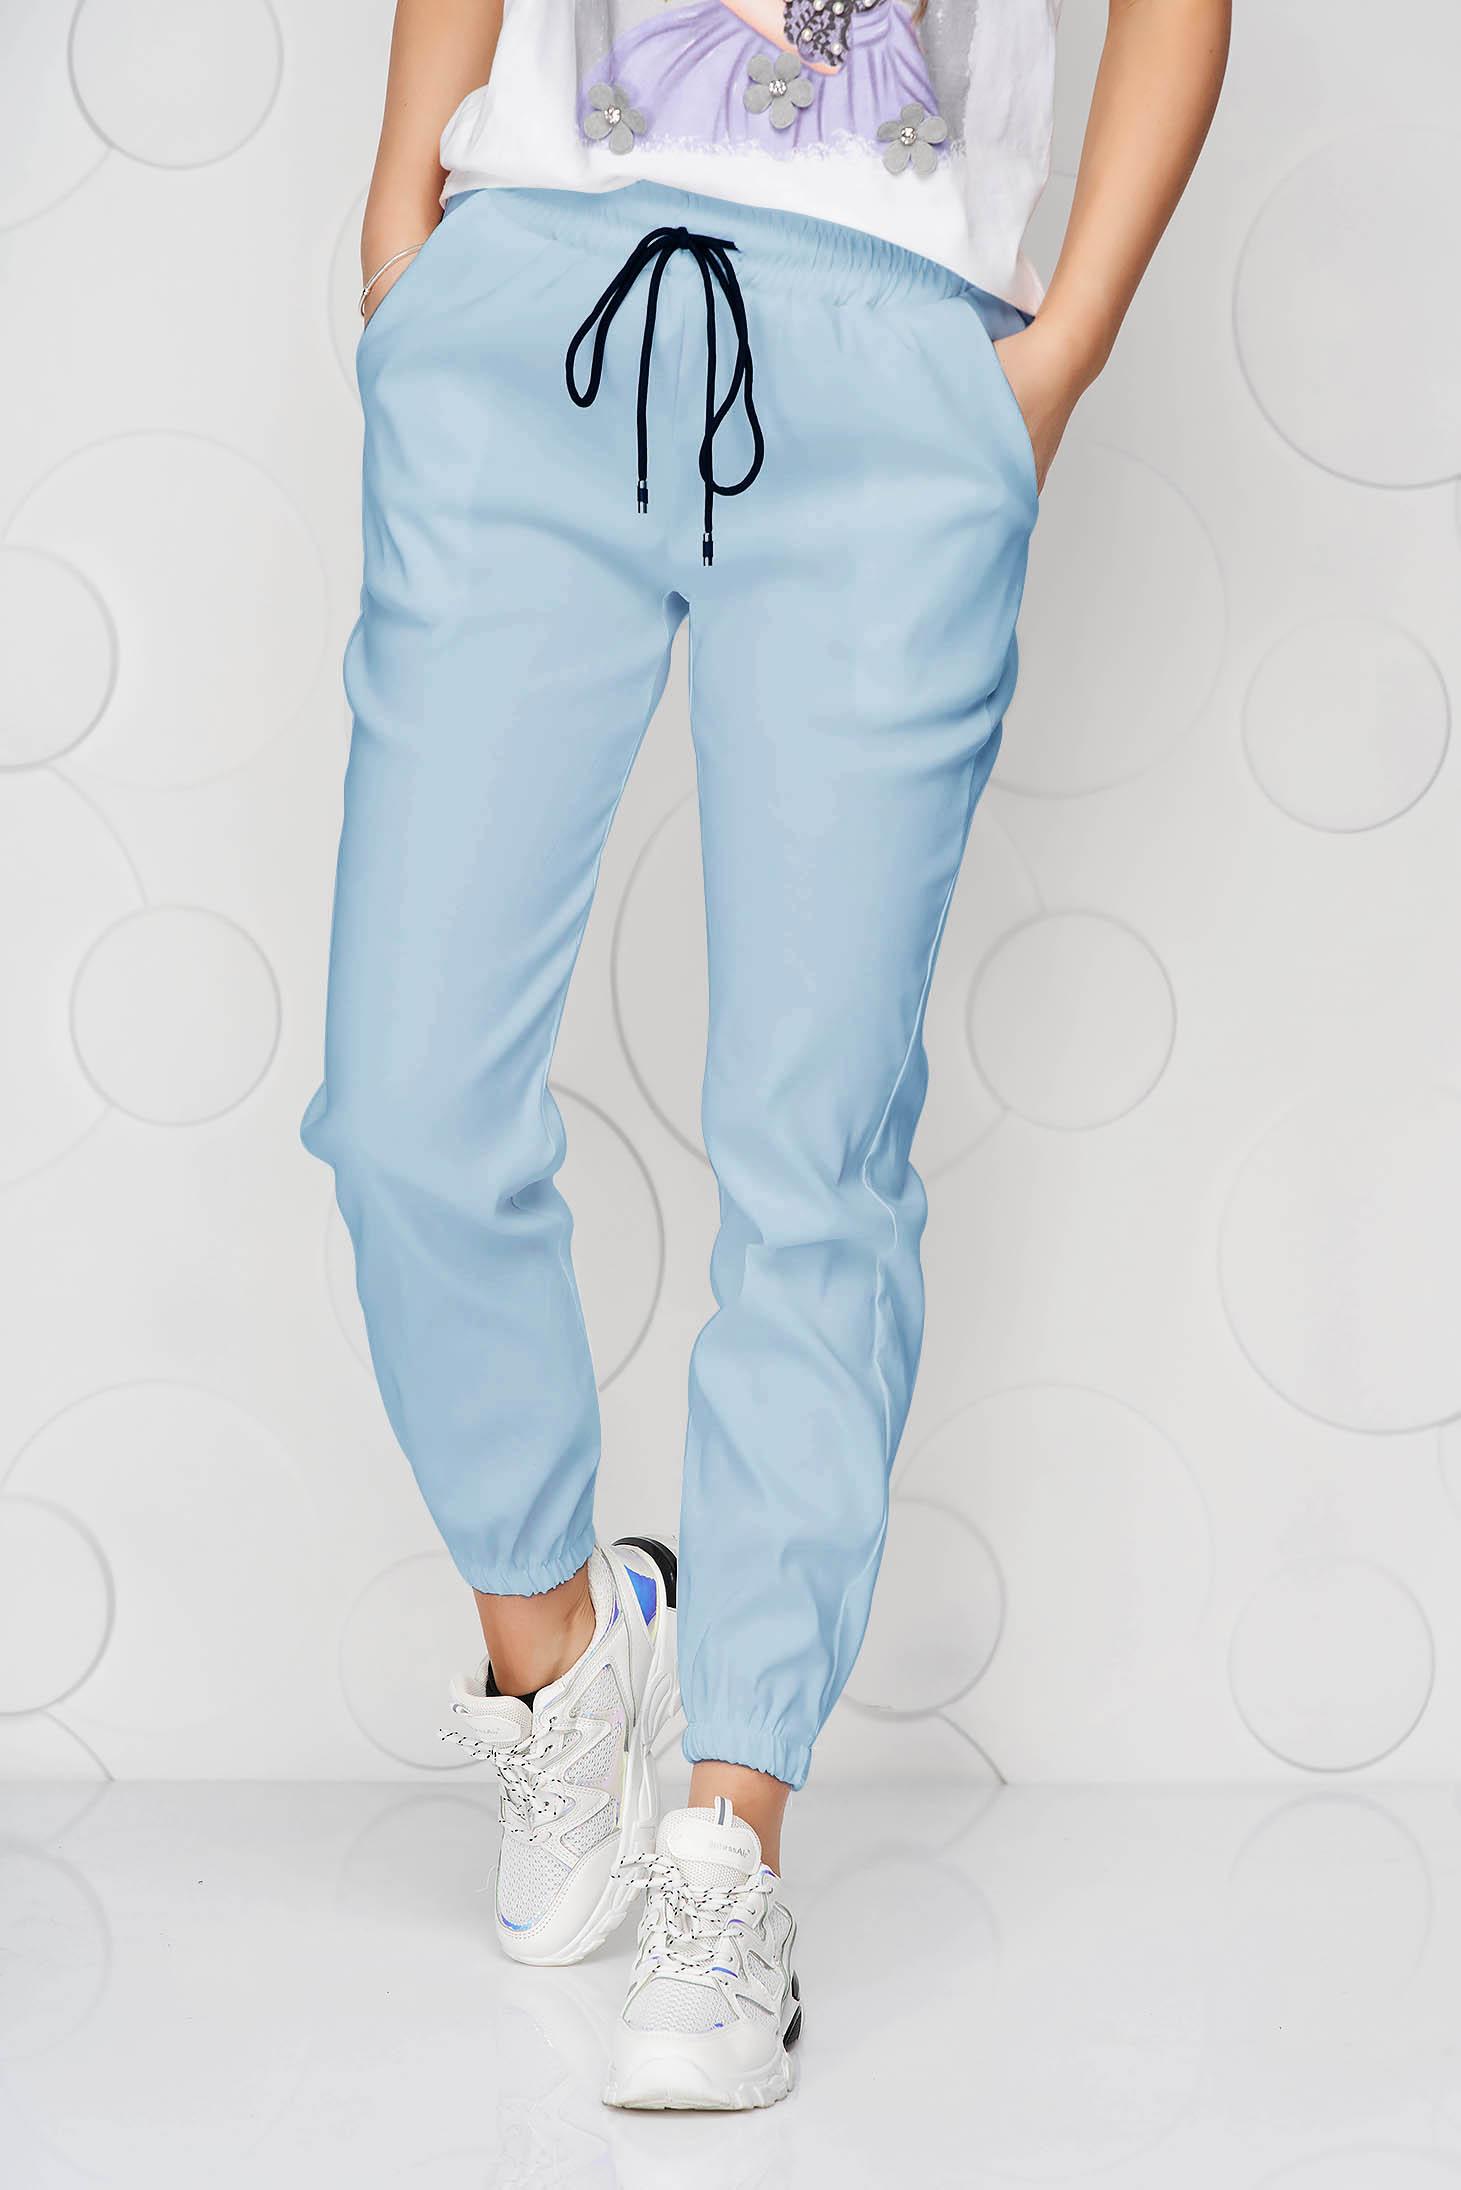 Lightblue trousers with pockets with medium waist thin fabric